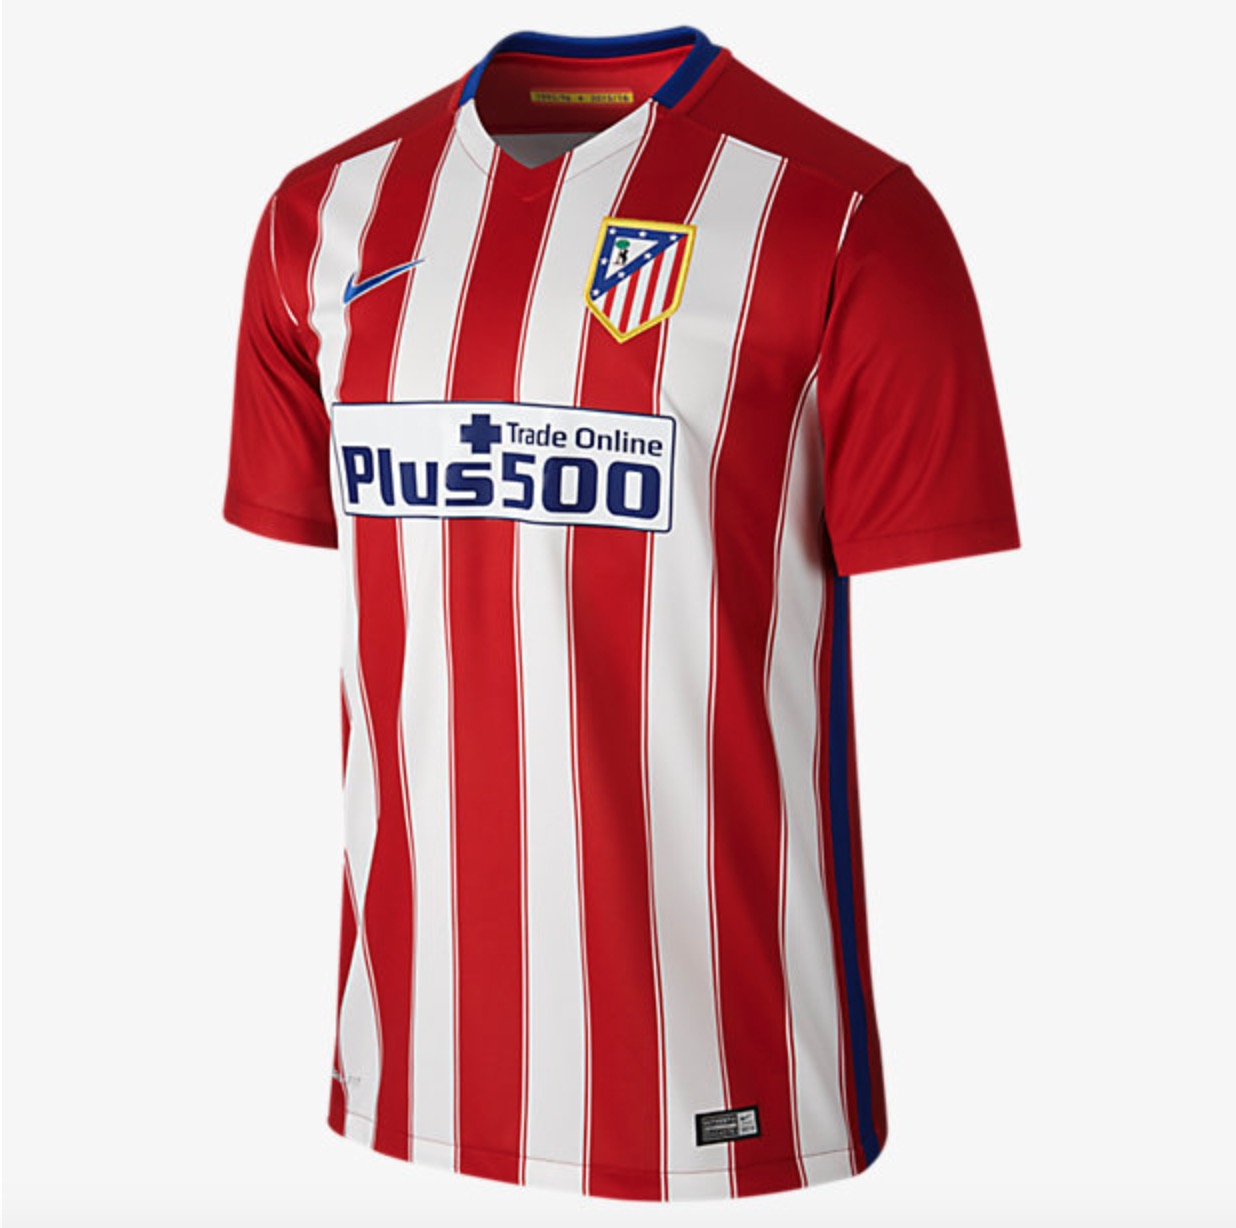 Maglia Home Atlético de Madrid prima